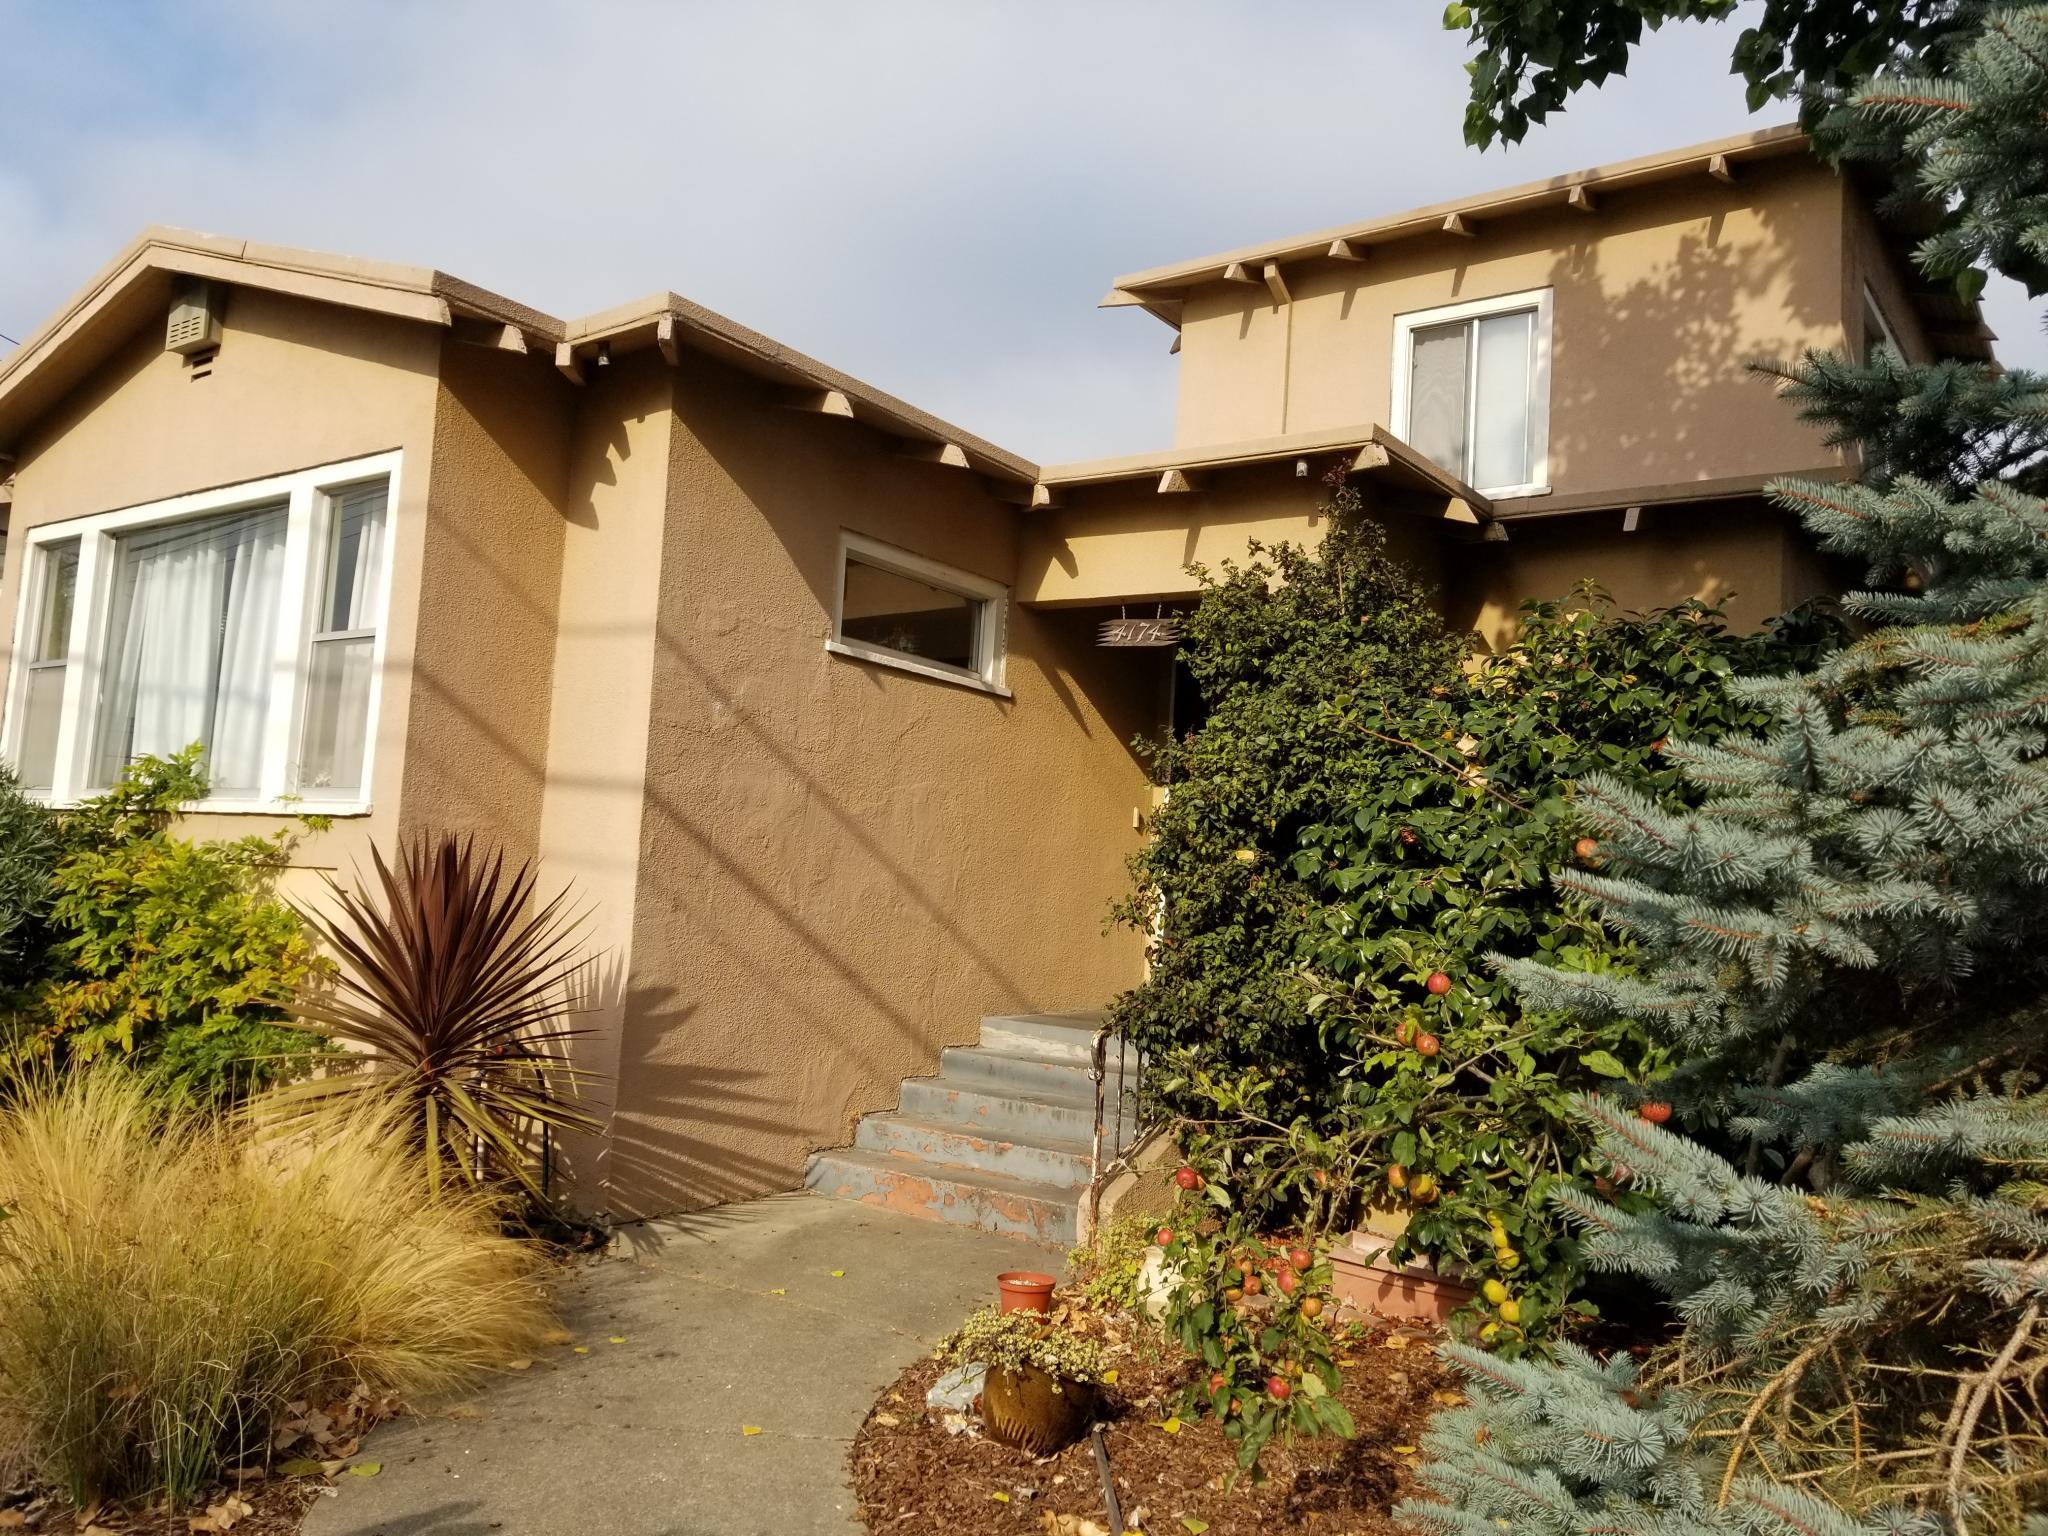 4174 Emerald St, Oakland, CA 94609 For Rent | Trulia